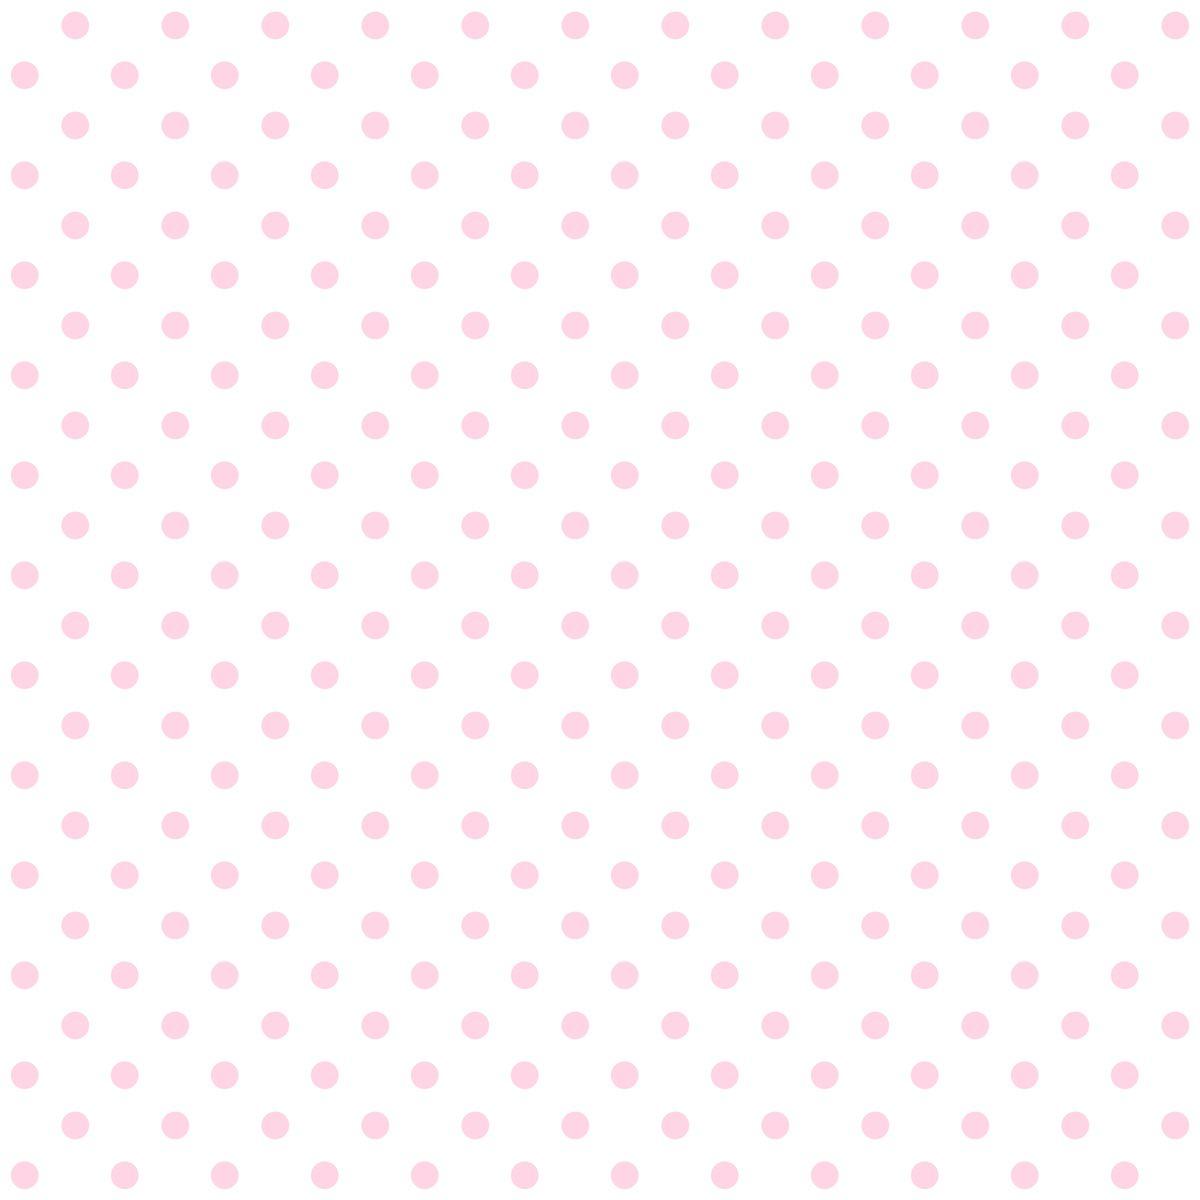 Free Digital Polka Dot Scrapbooking Papers - Ausdruckbare - Free Printable Pink Polka Dot Paper